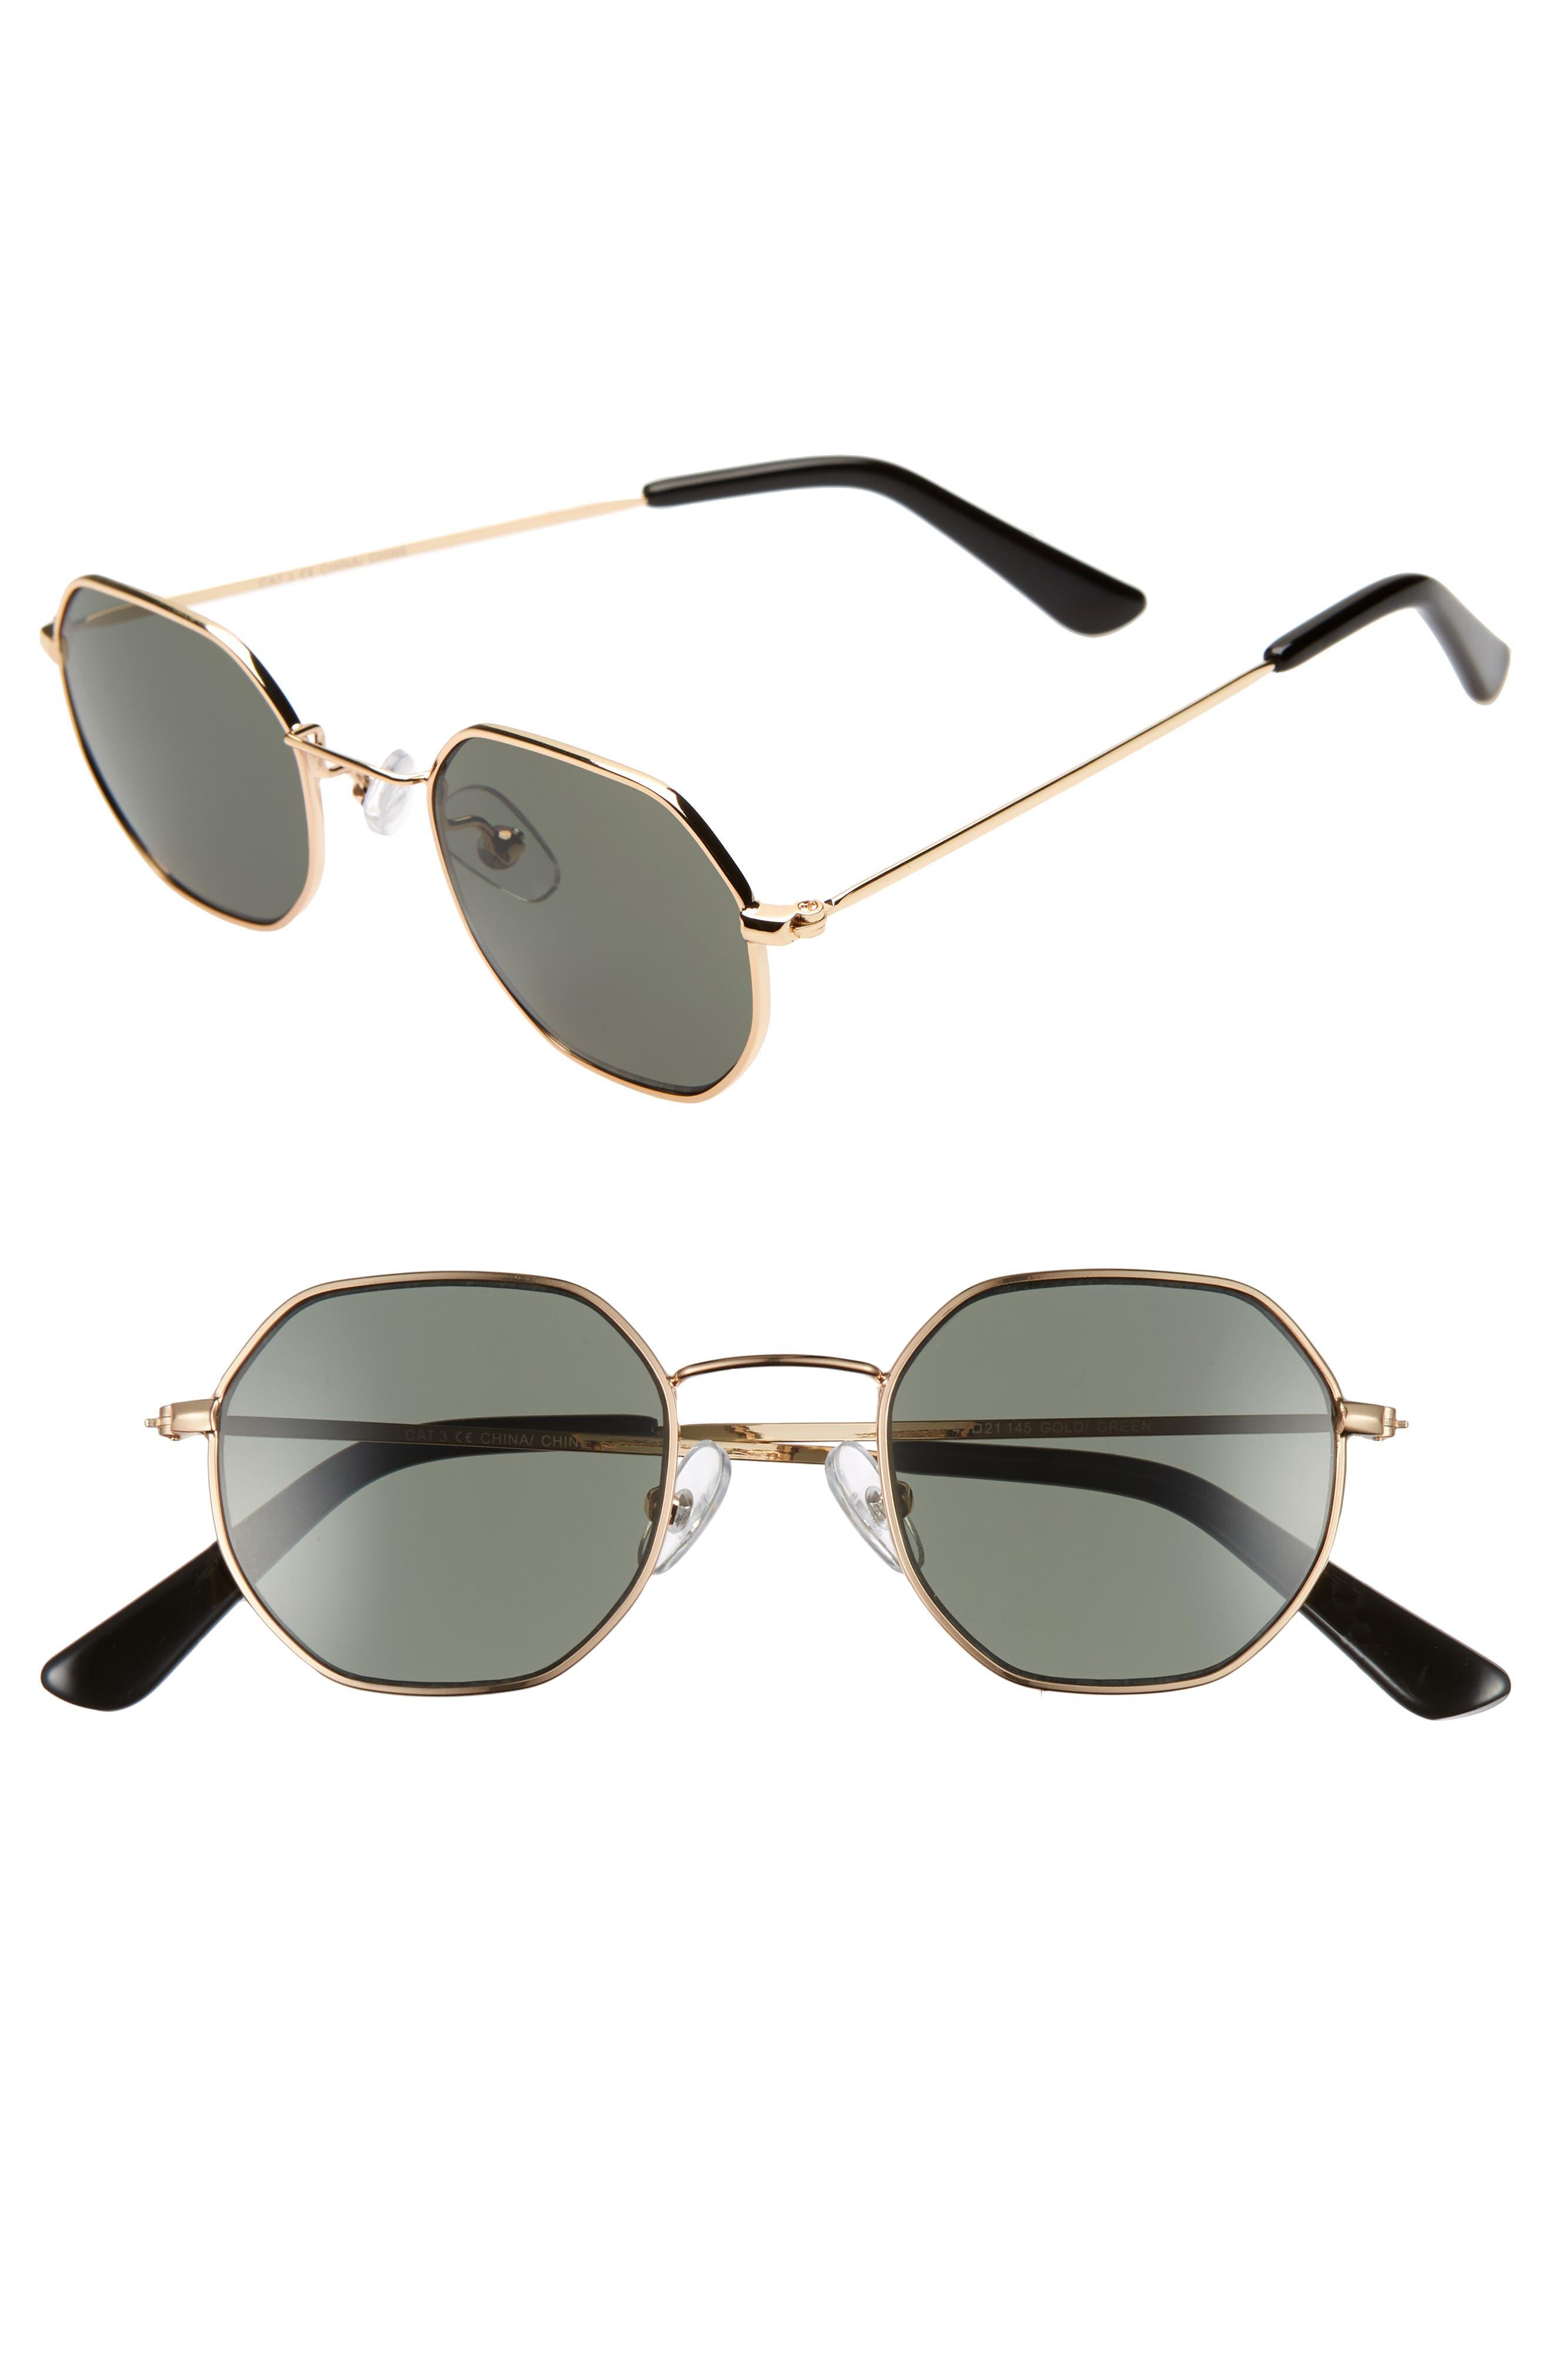 THE RAIL, Gino 45mm Round Sunglasses, Main thumbnail 1, color, GOLD/ GREEN